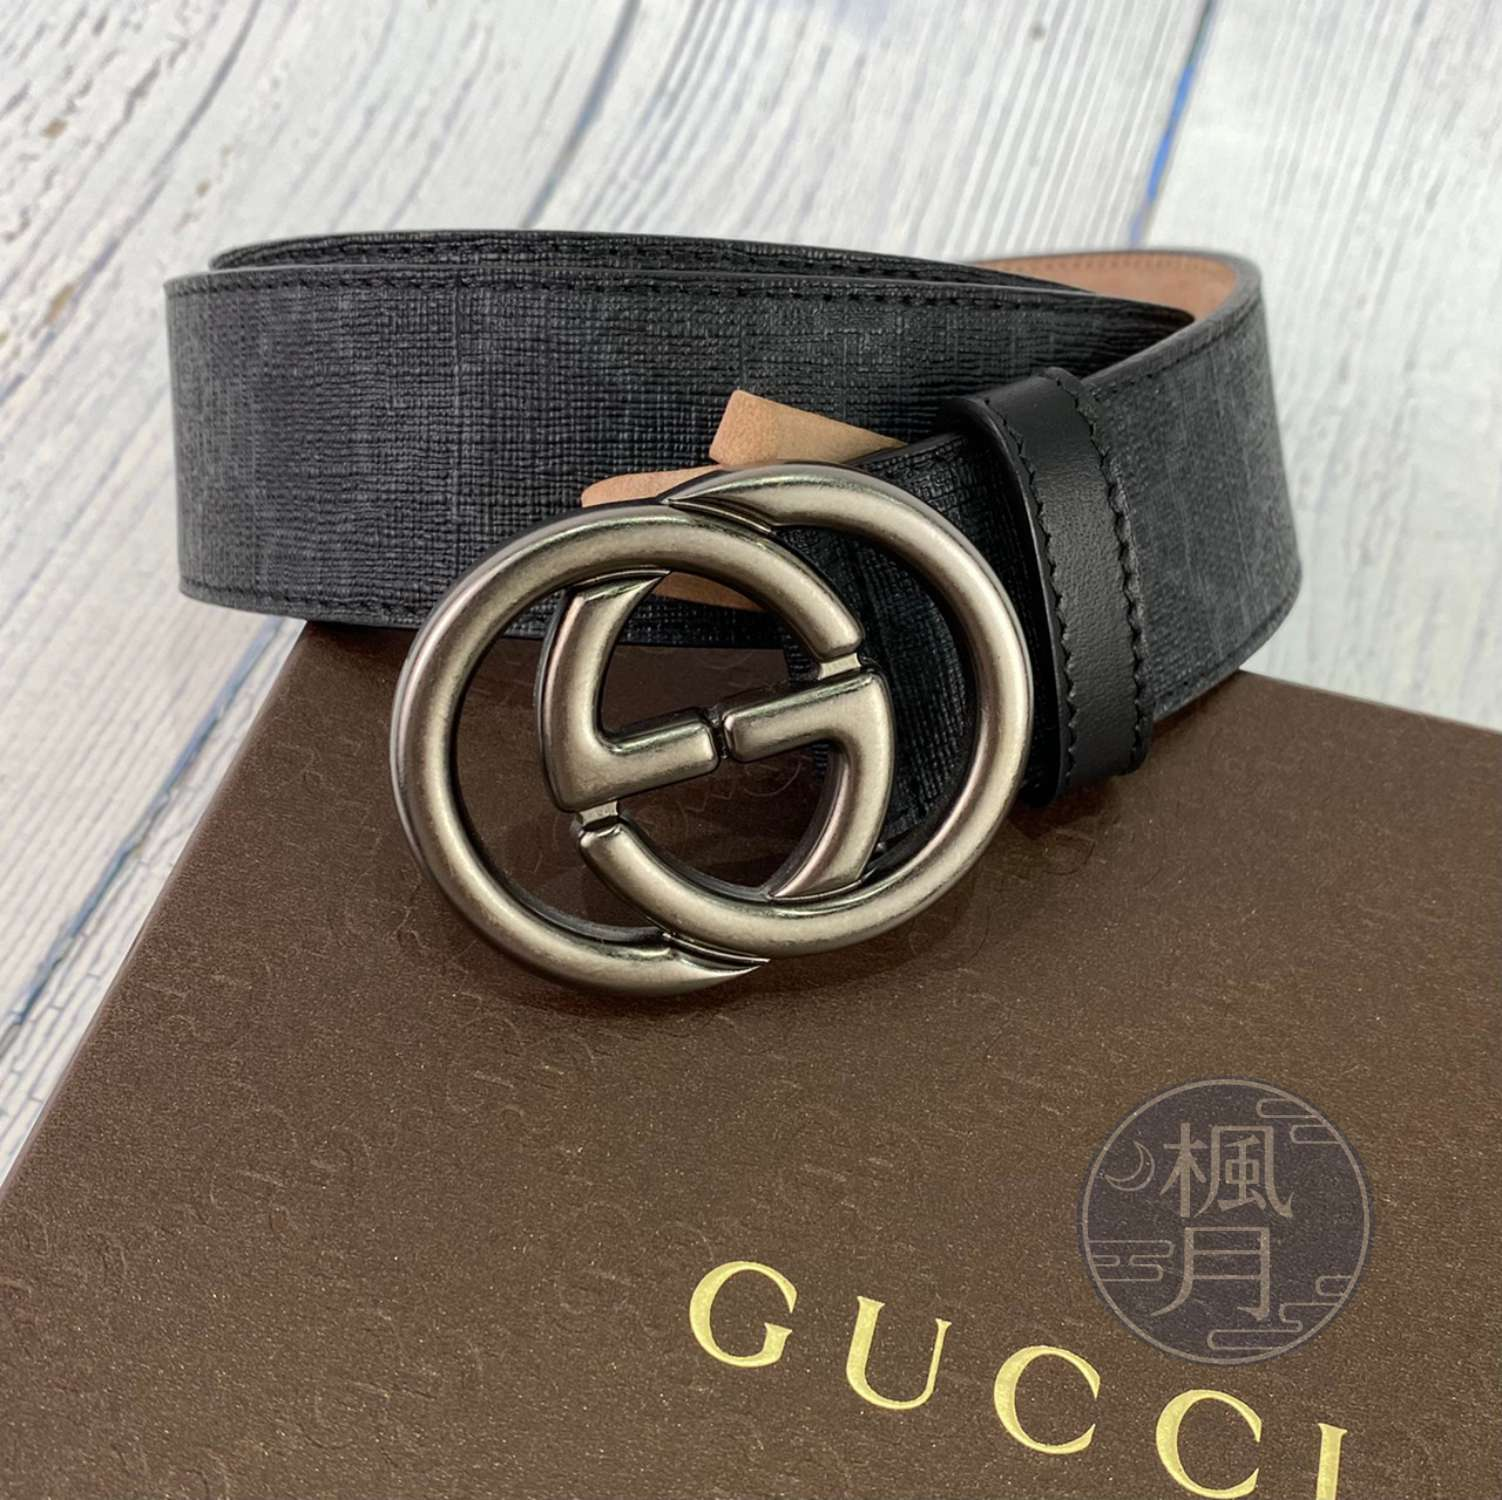 BRAND楓月 GUCCI 古馳 295777 經典 黑色 GG紋 PVC 皮帶 金屬 男用 腰帶 #90CM